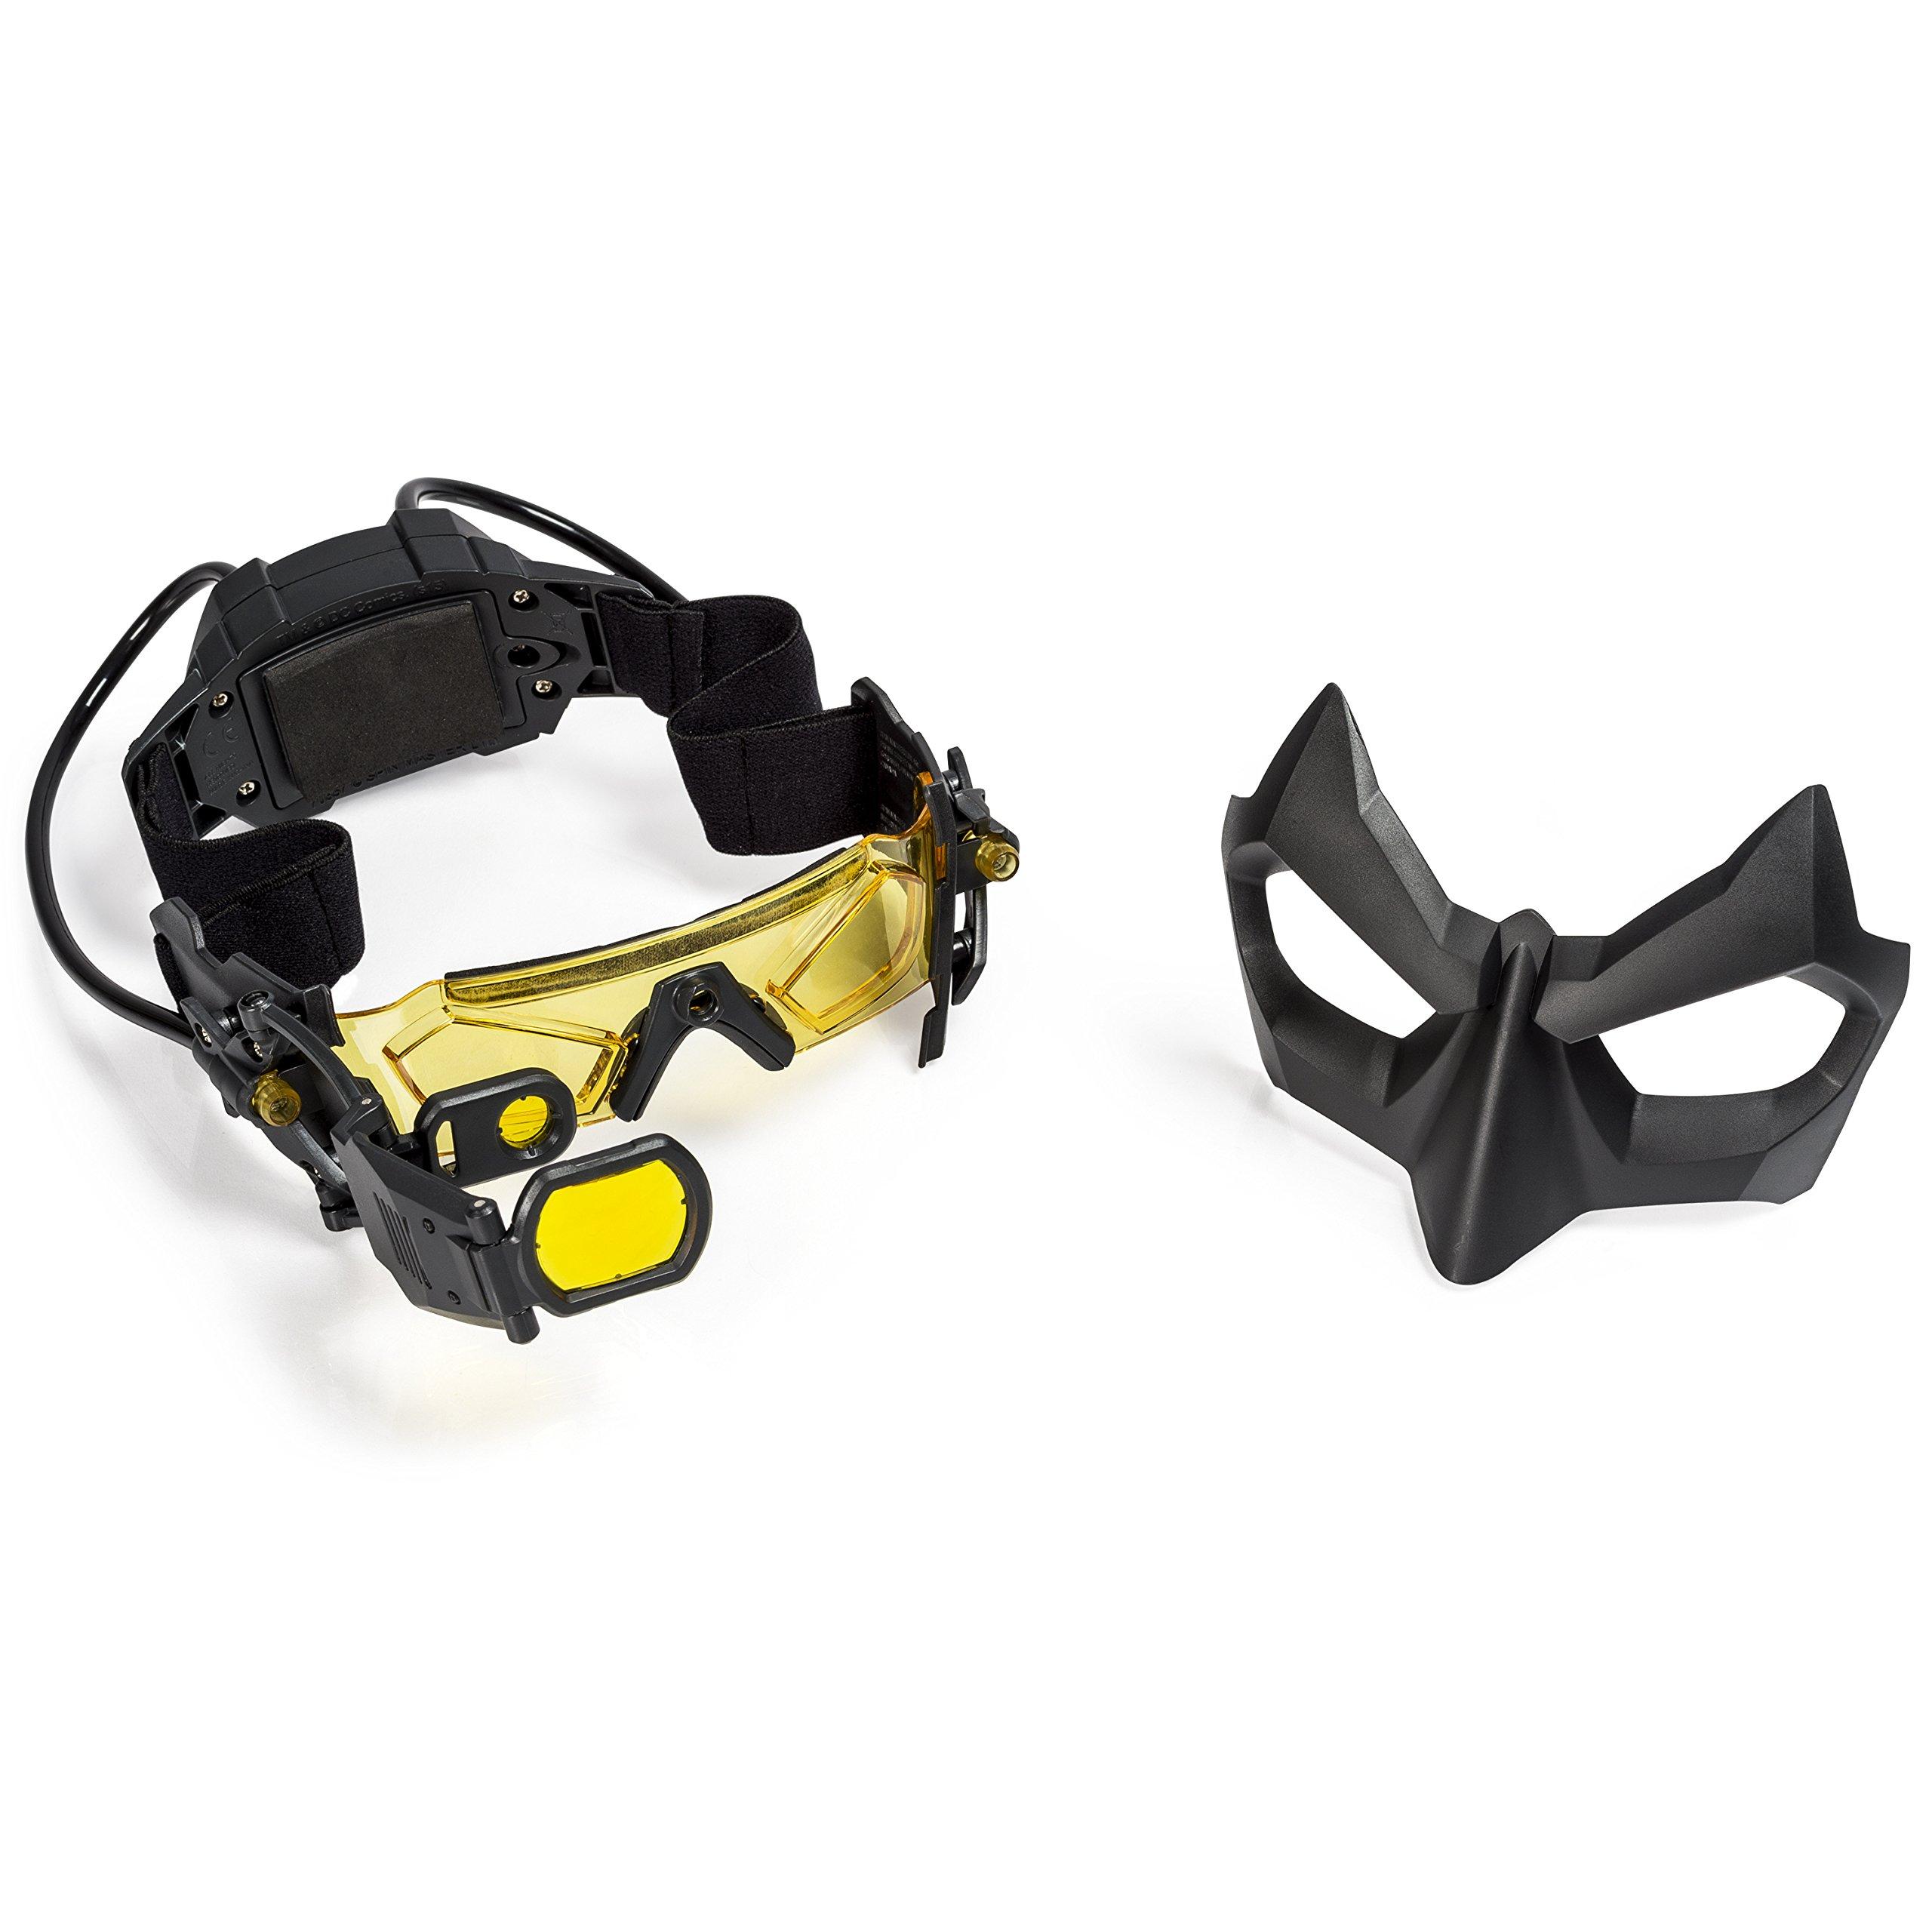 Spy Gear - Batman Night Goggles by Spy Gear (Image #3)